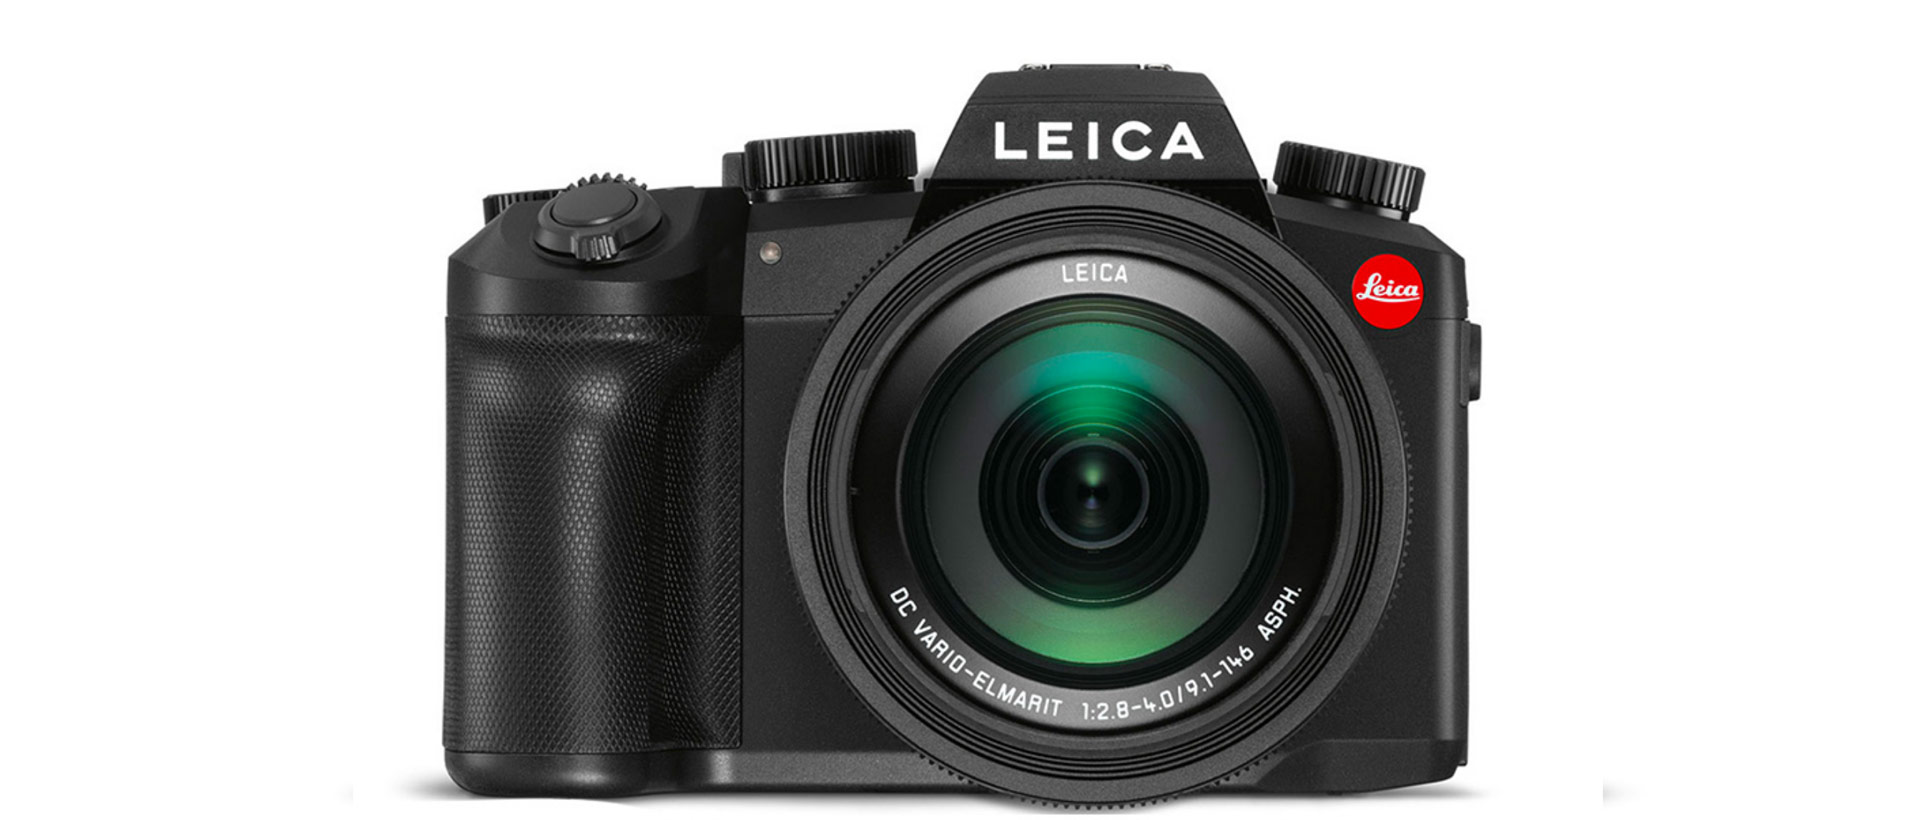 Meister Camera Leica Kompakt